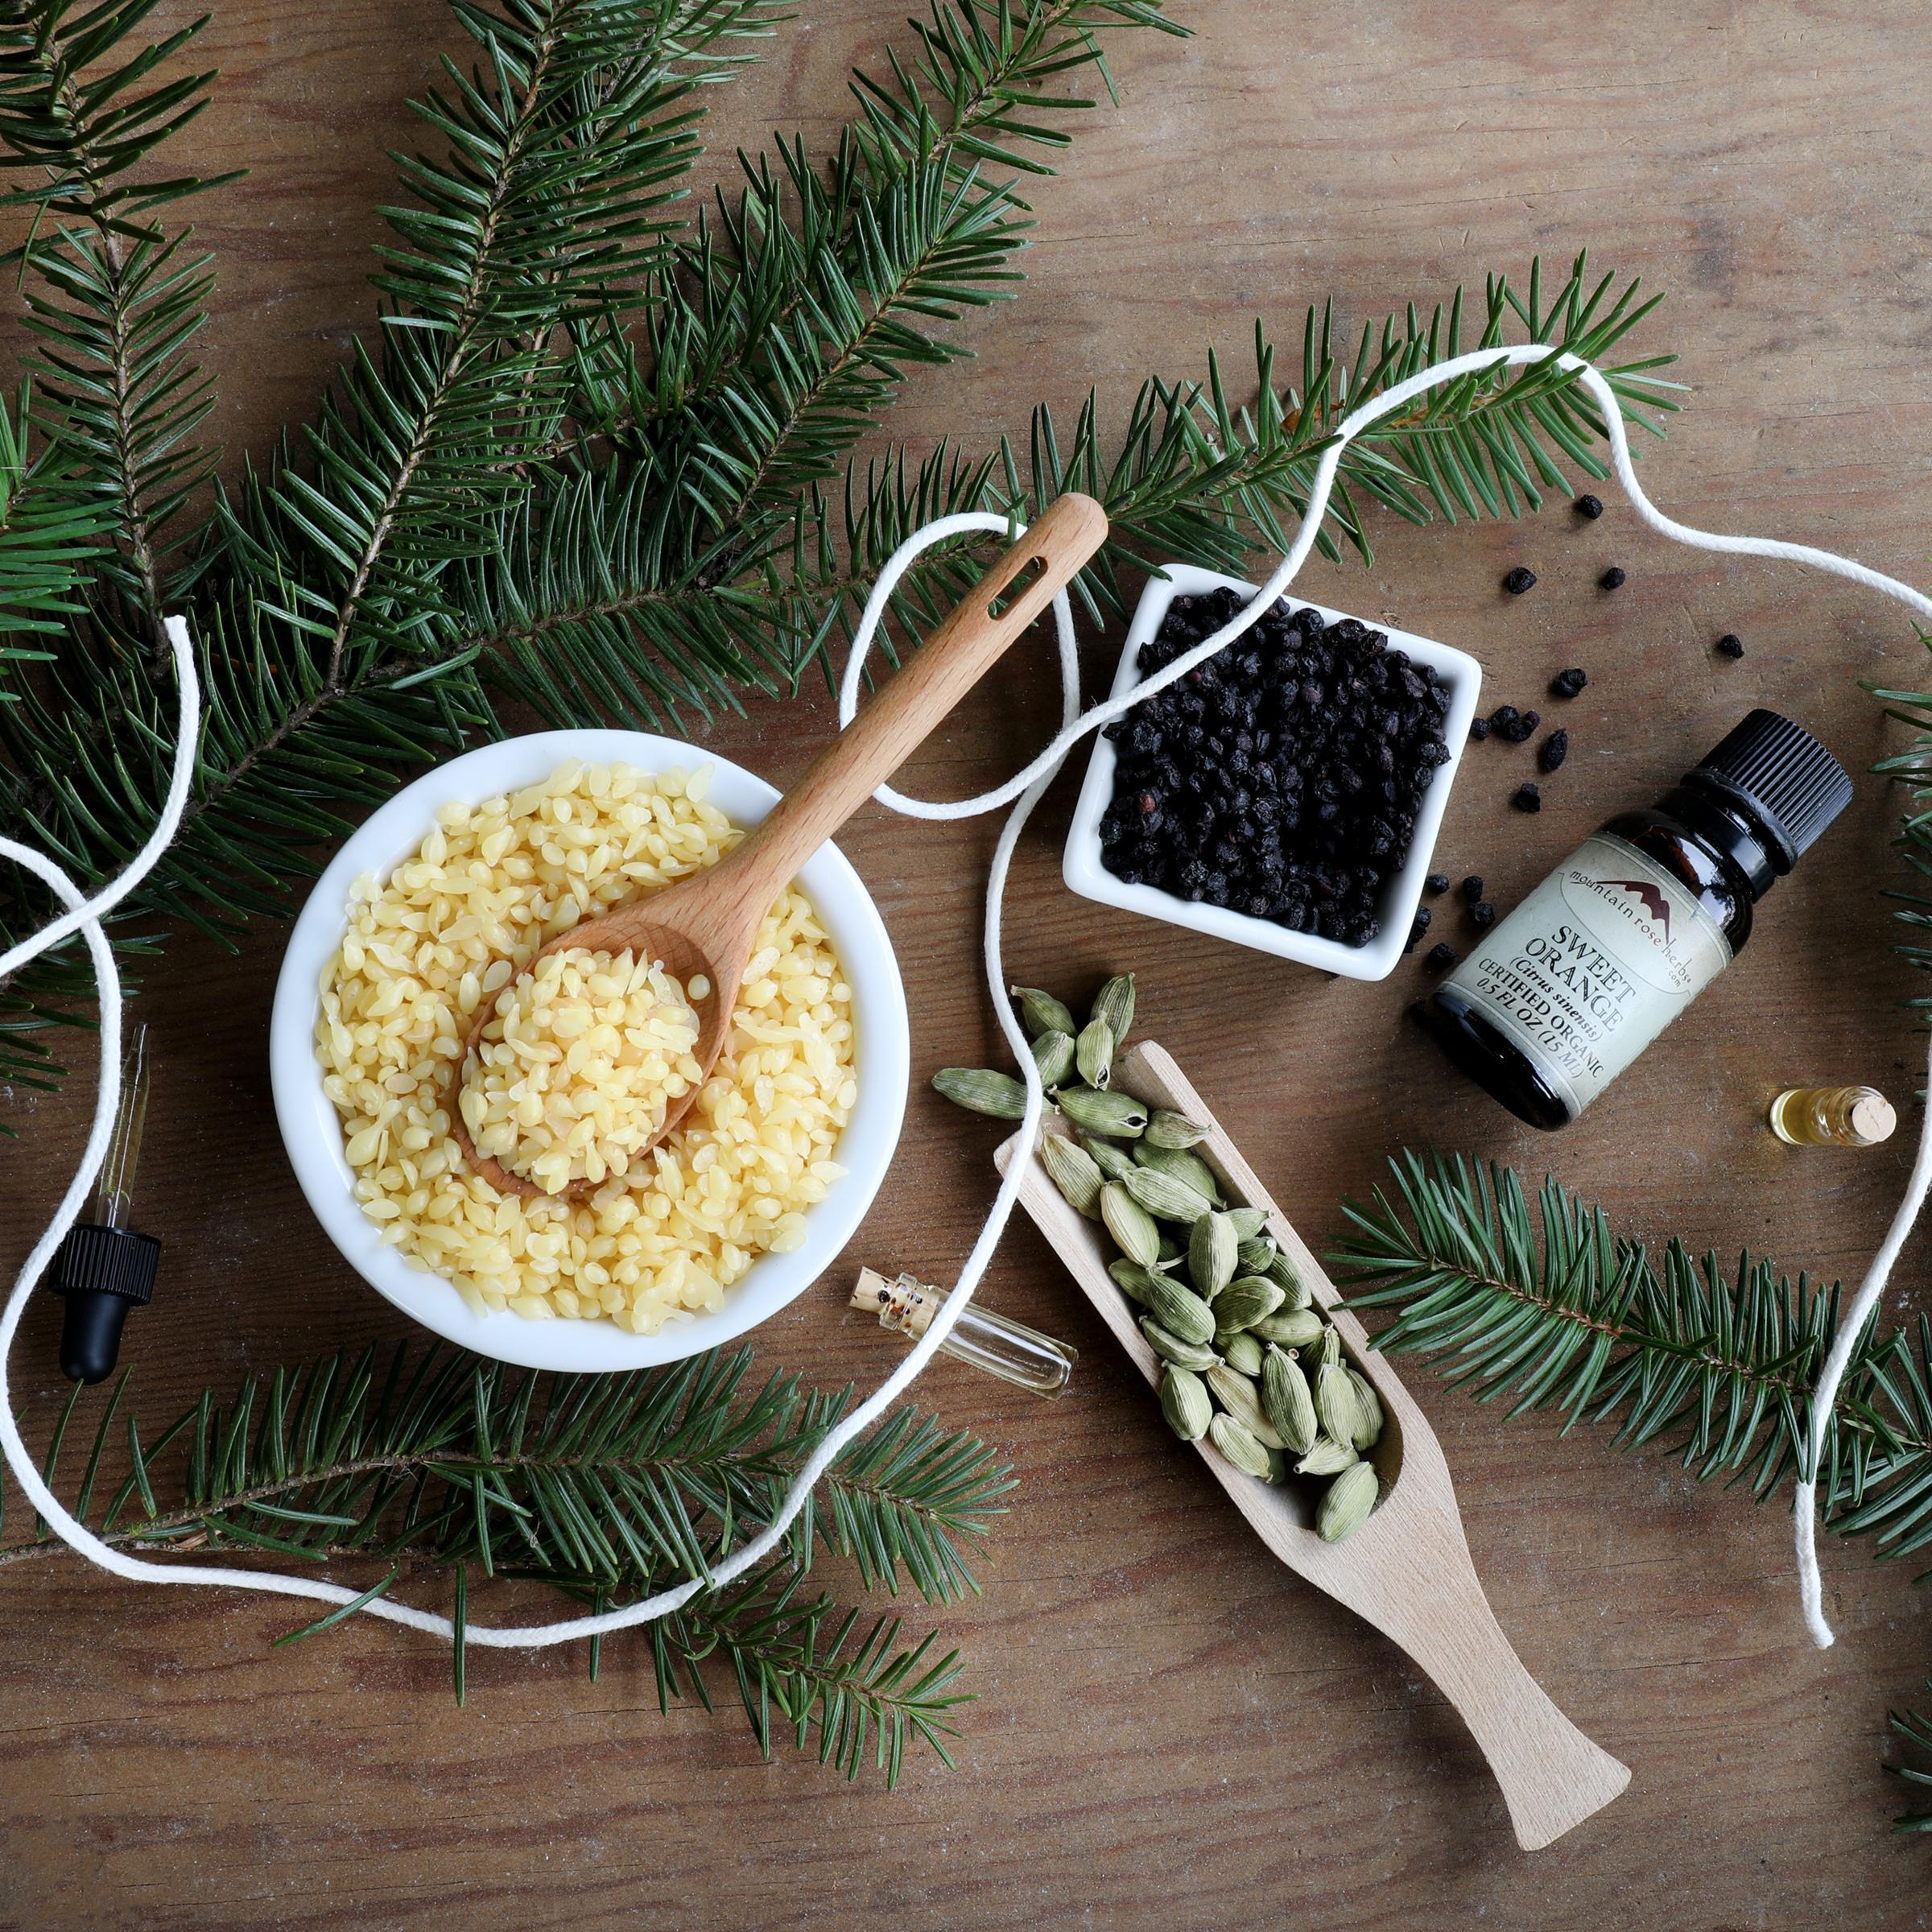 Displayed DIY ingredients with evergreen sprigs